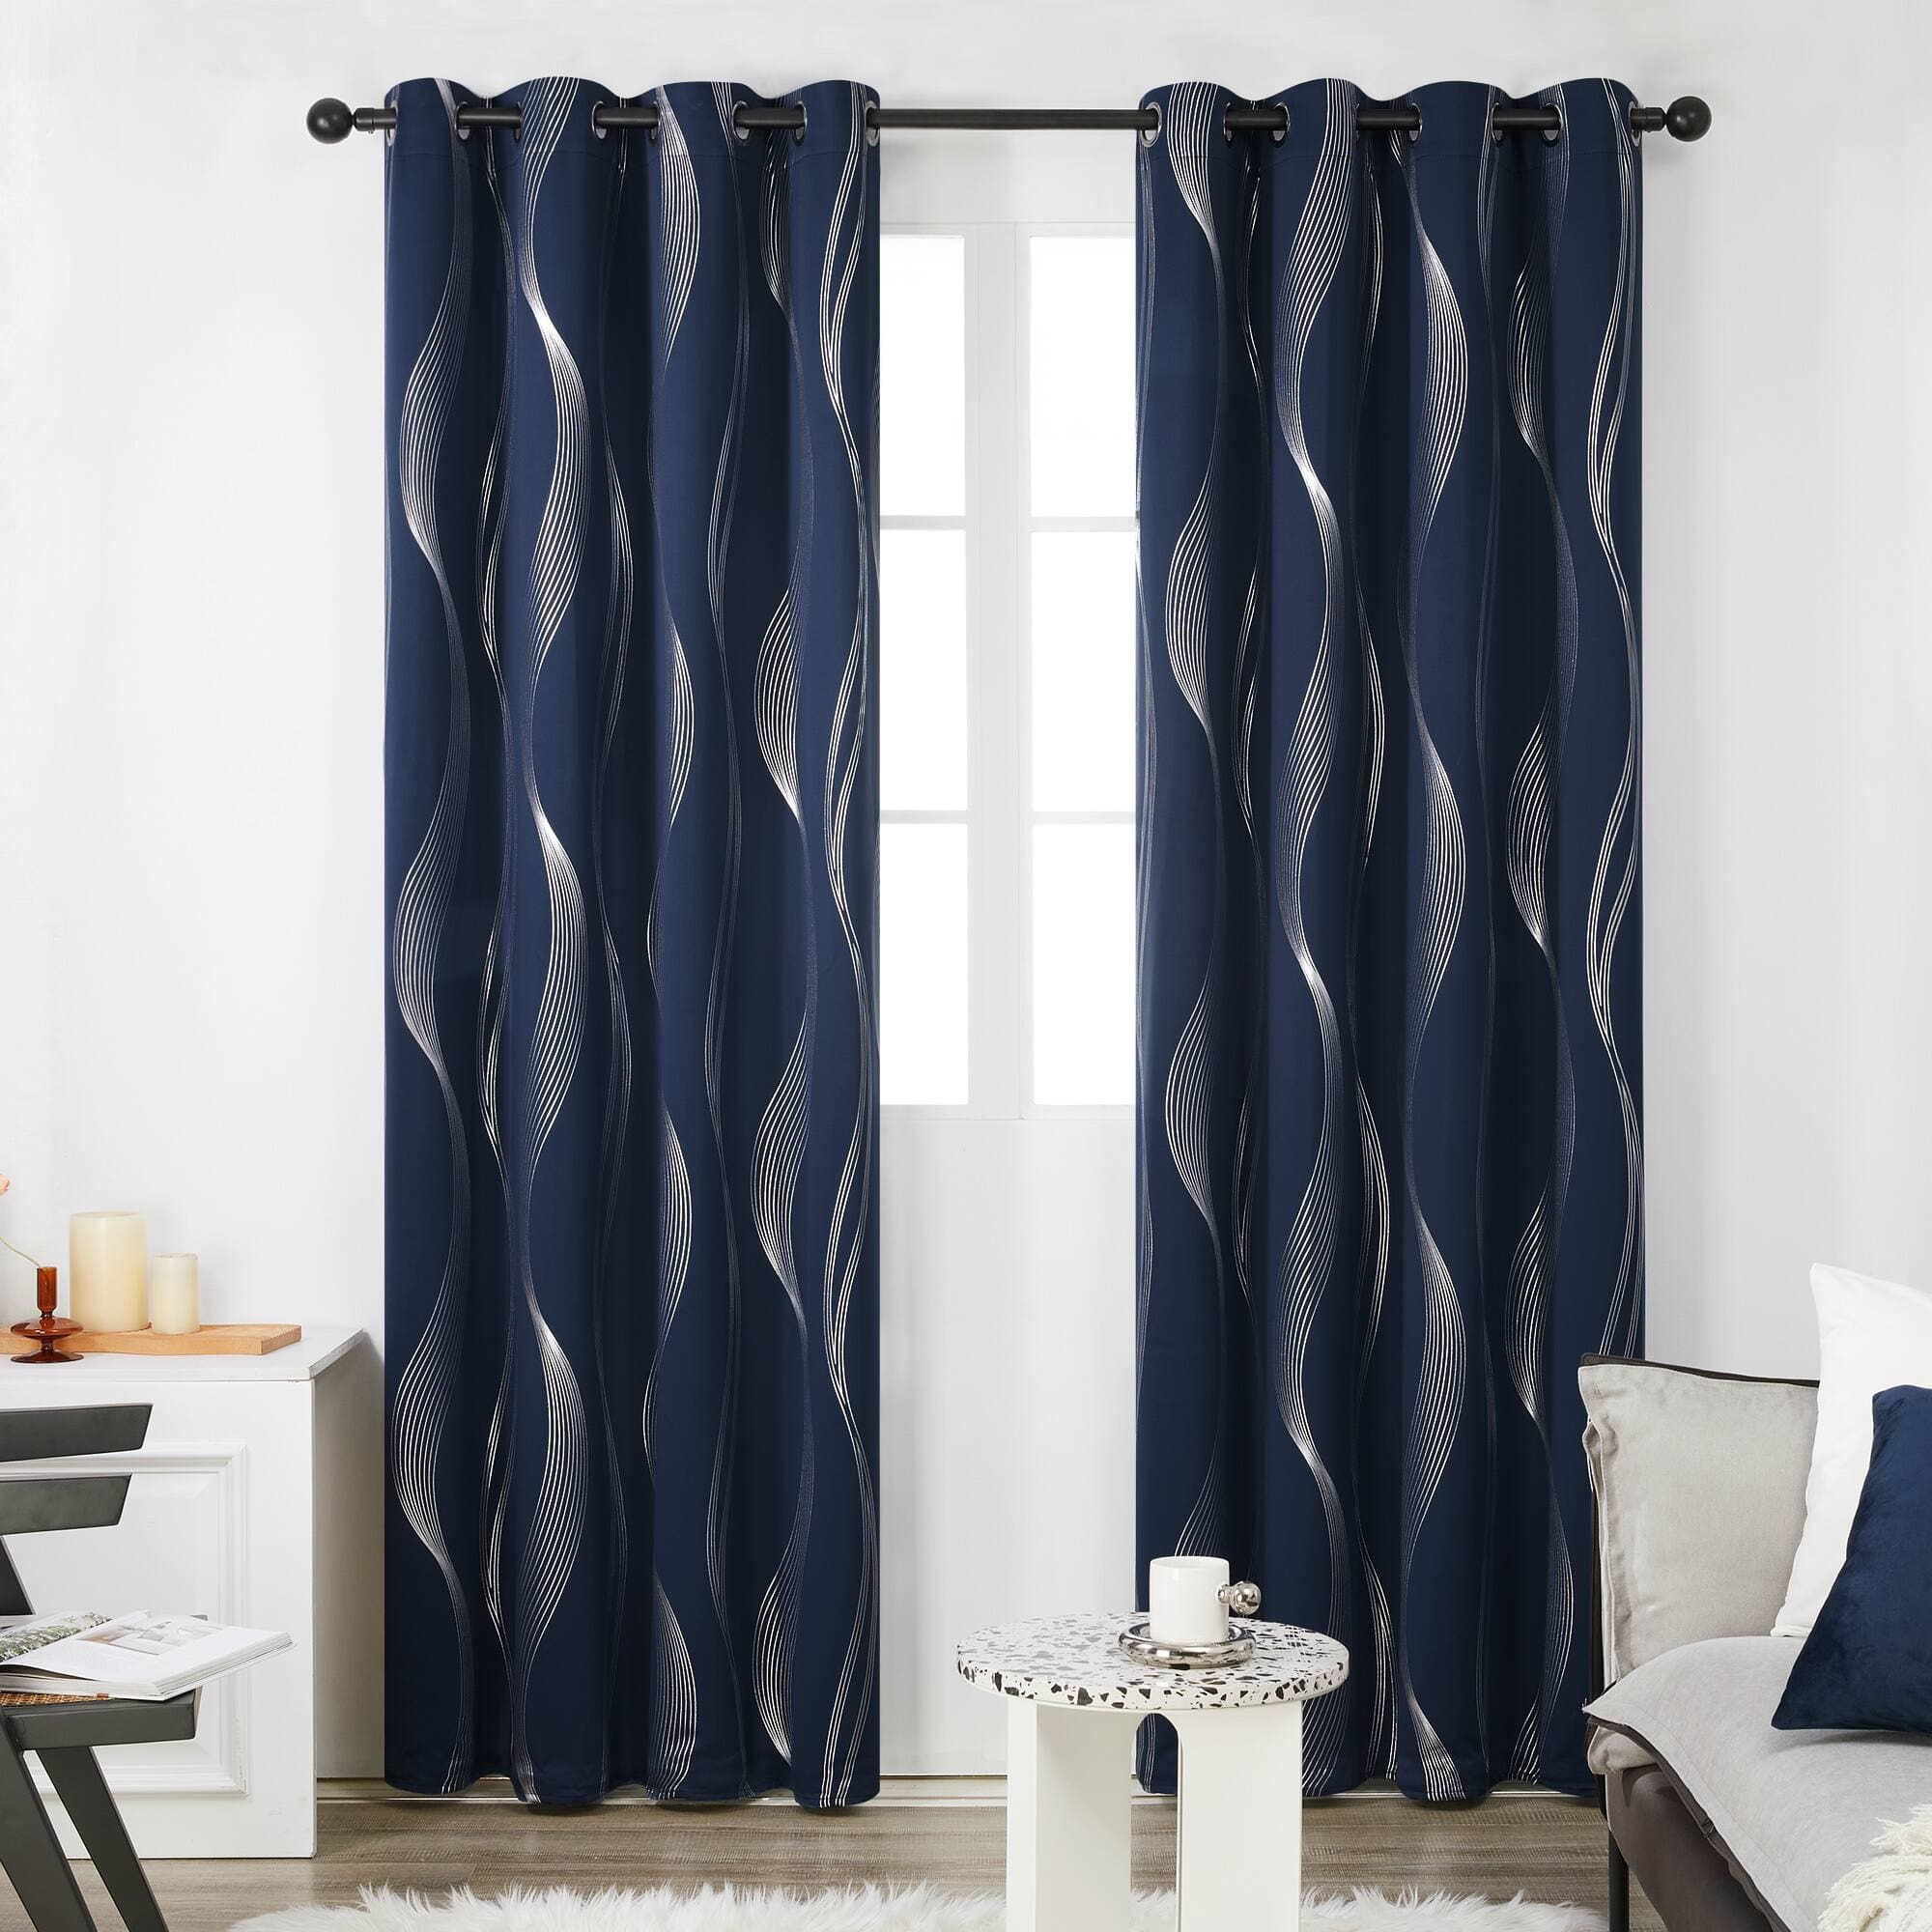 Deconovo Foil Print Blackout Curtains For $16.57 + Free Shipping w/ Prime